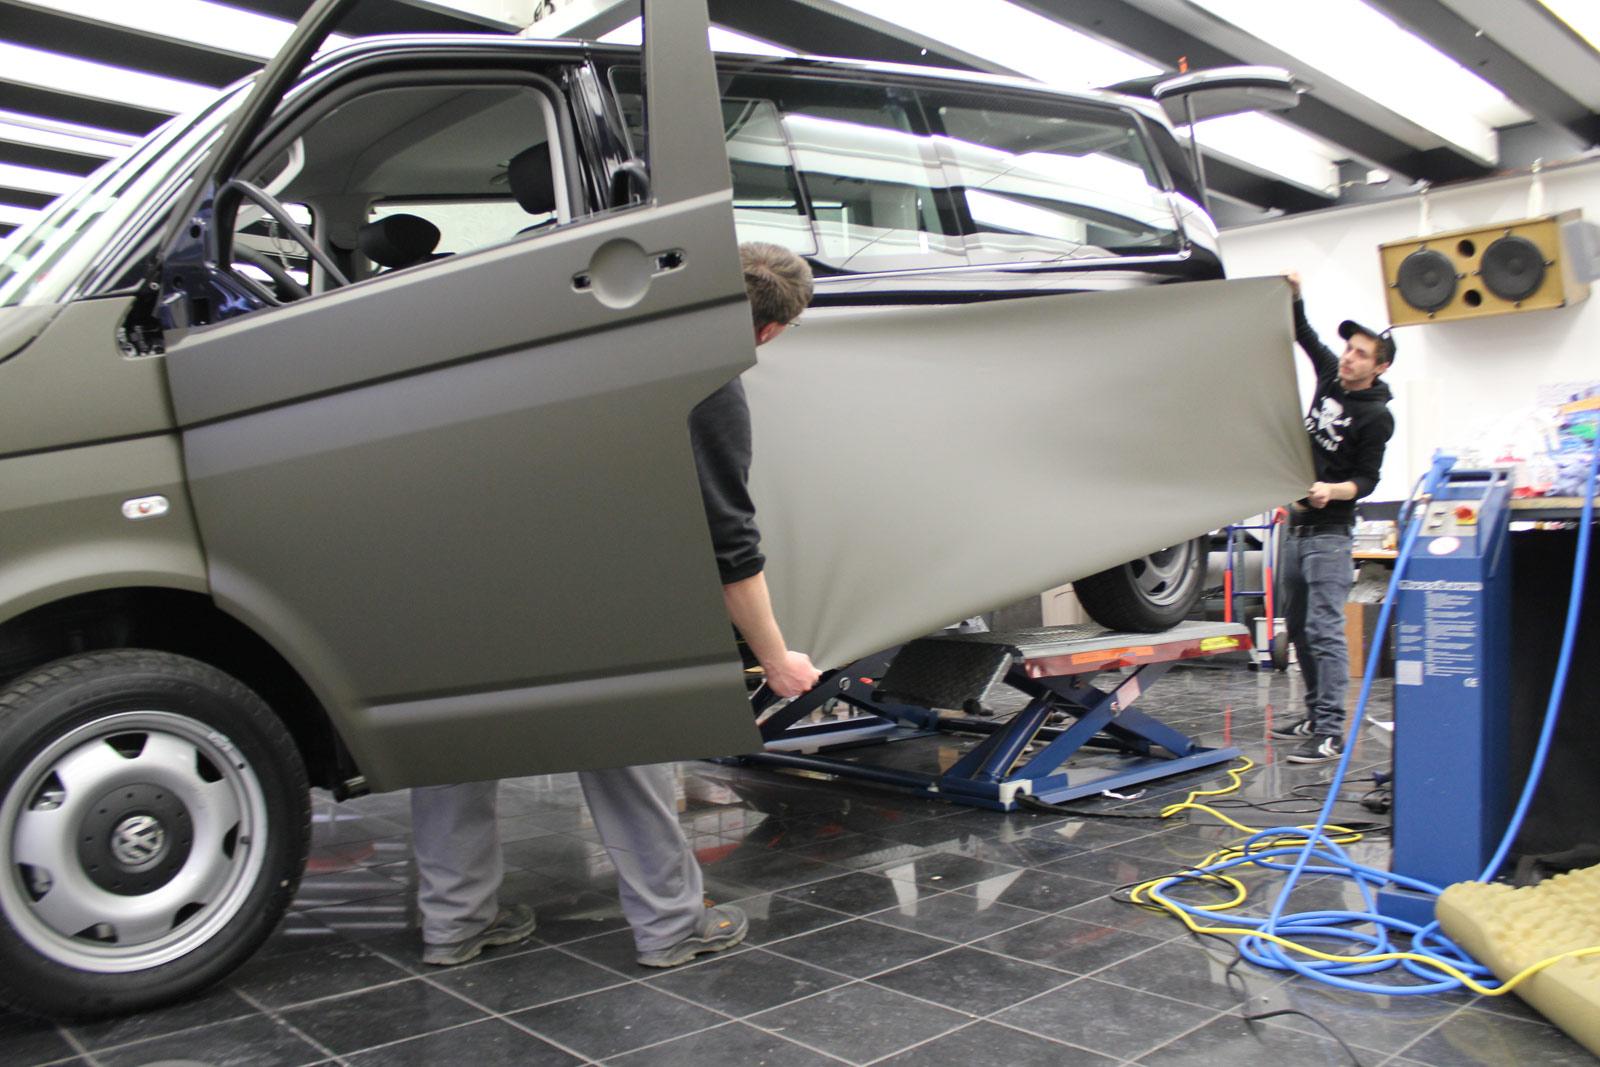 VW_T5_VOLLFOLIERUNG_NATO-OLIV_02